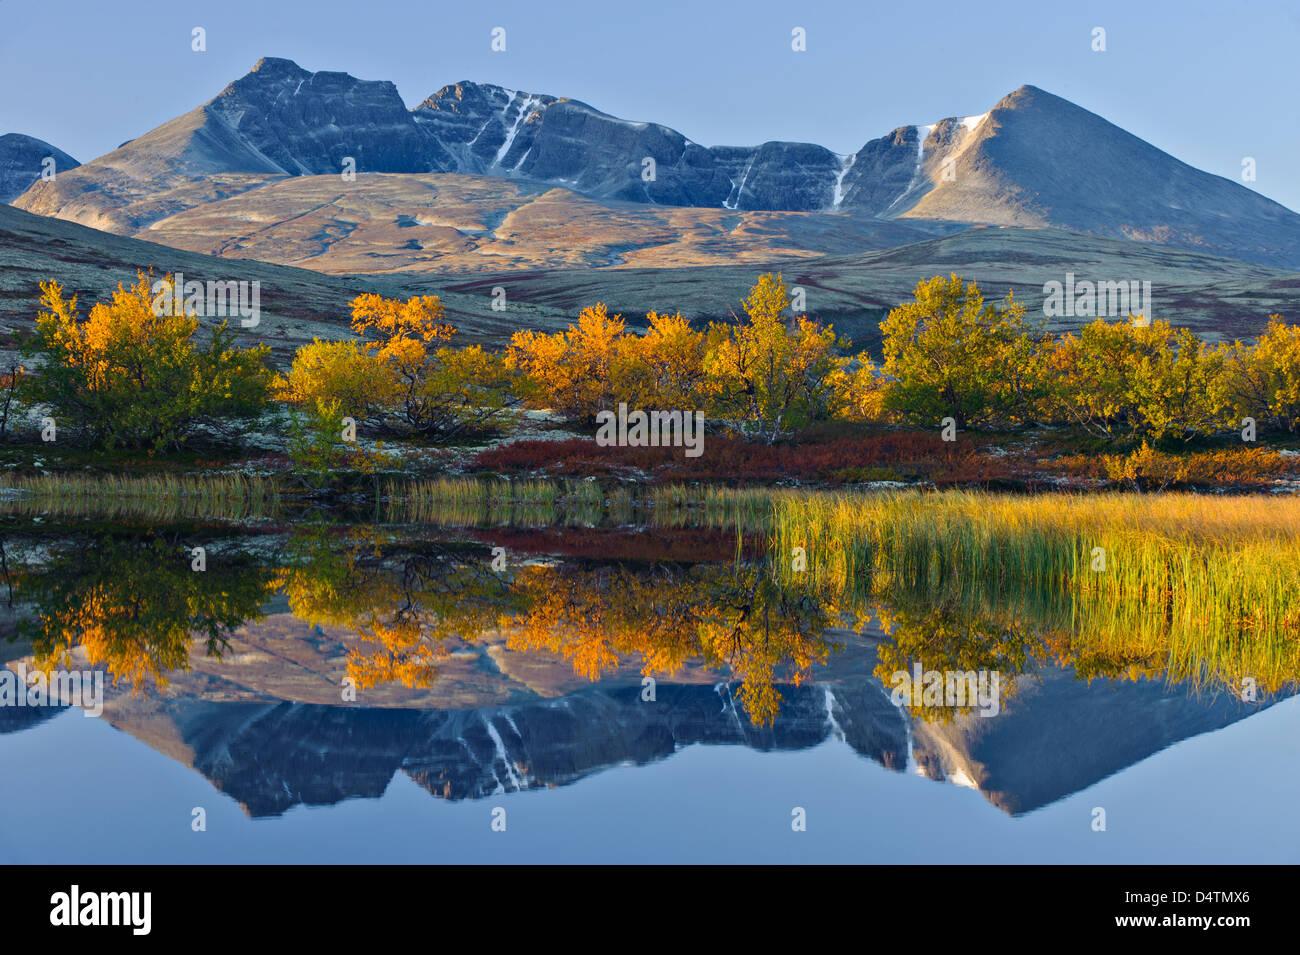 Reflet de Rondslottet mountain. Parc national de Rondane, Norvège, Europe Photo Stock